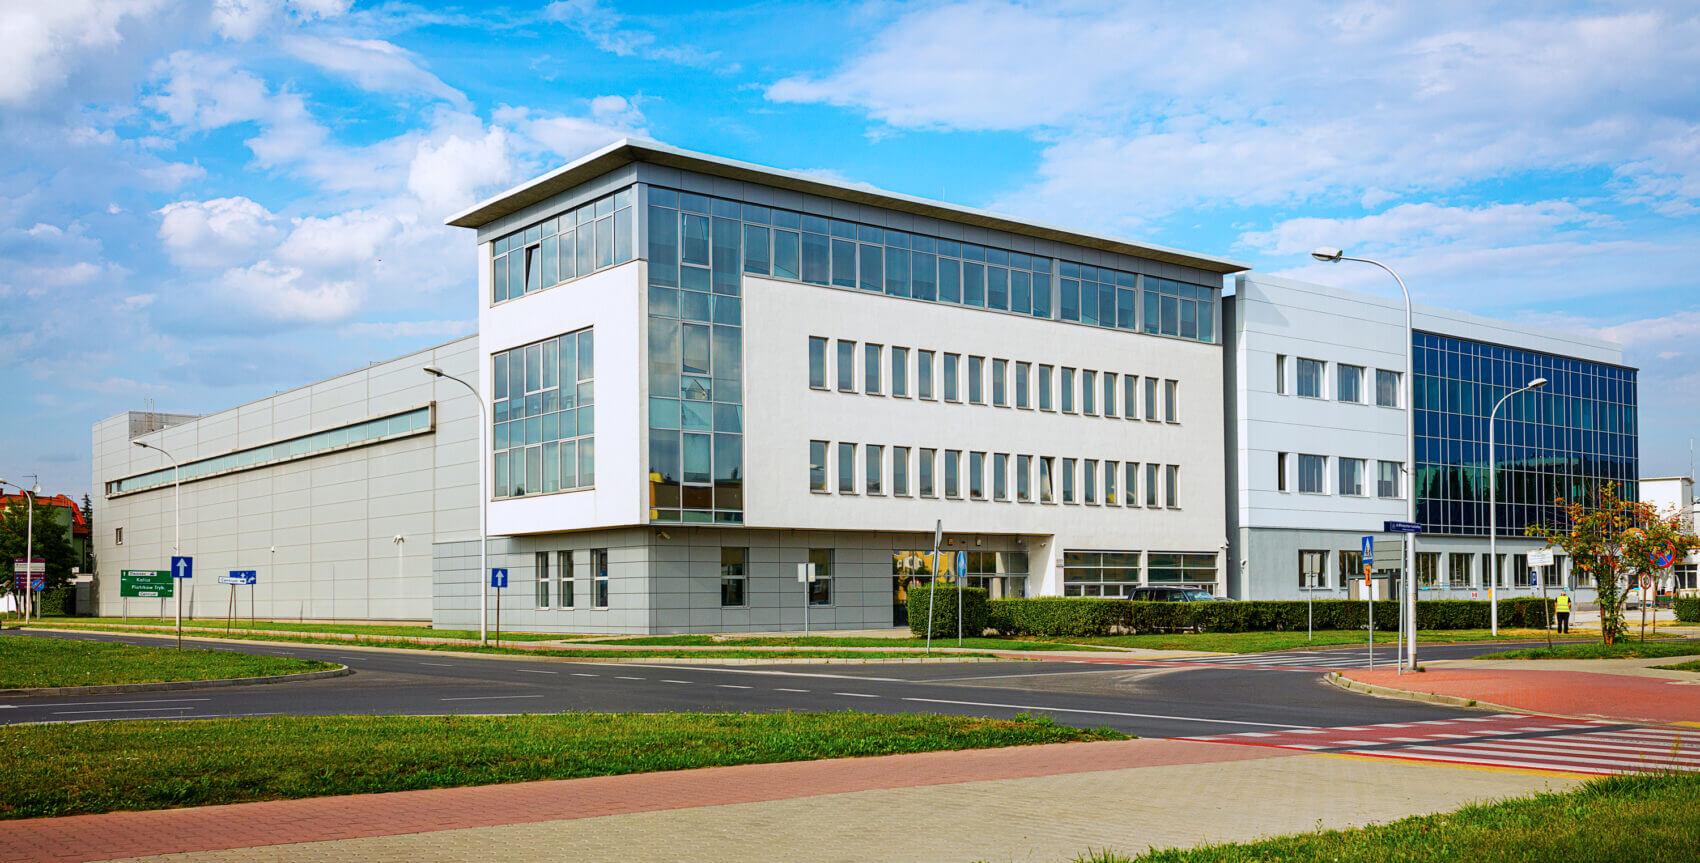 Medana plant building